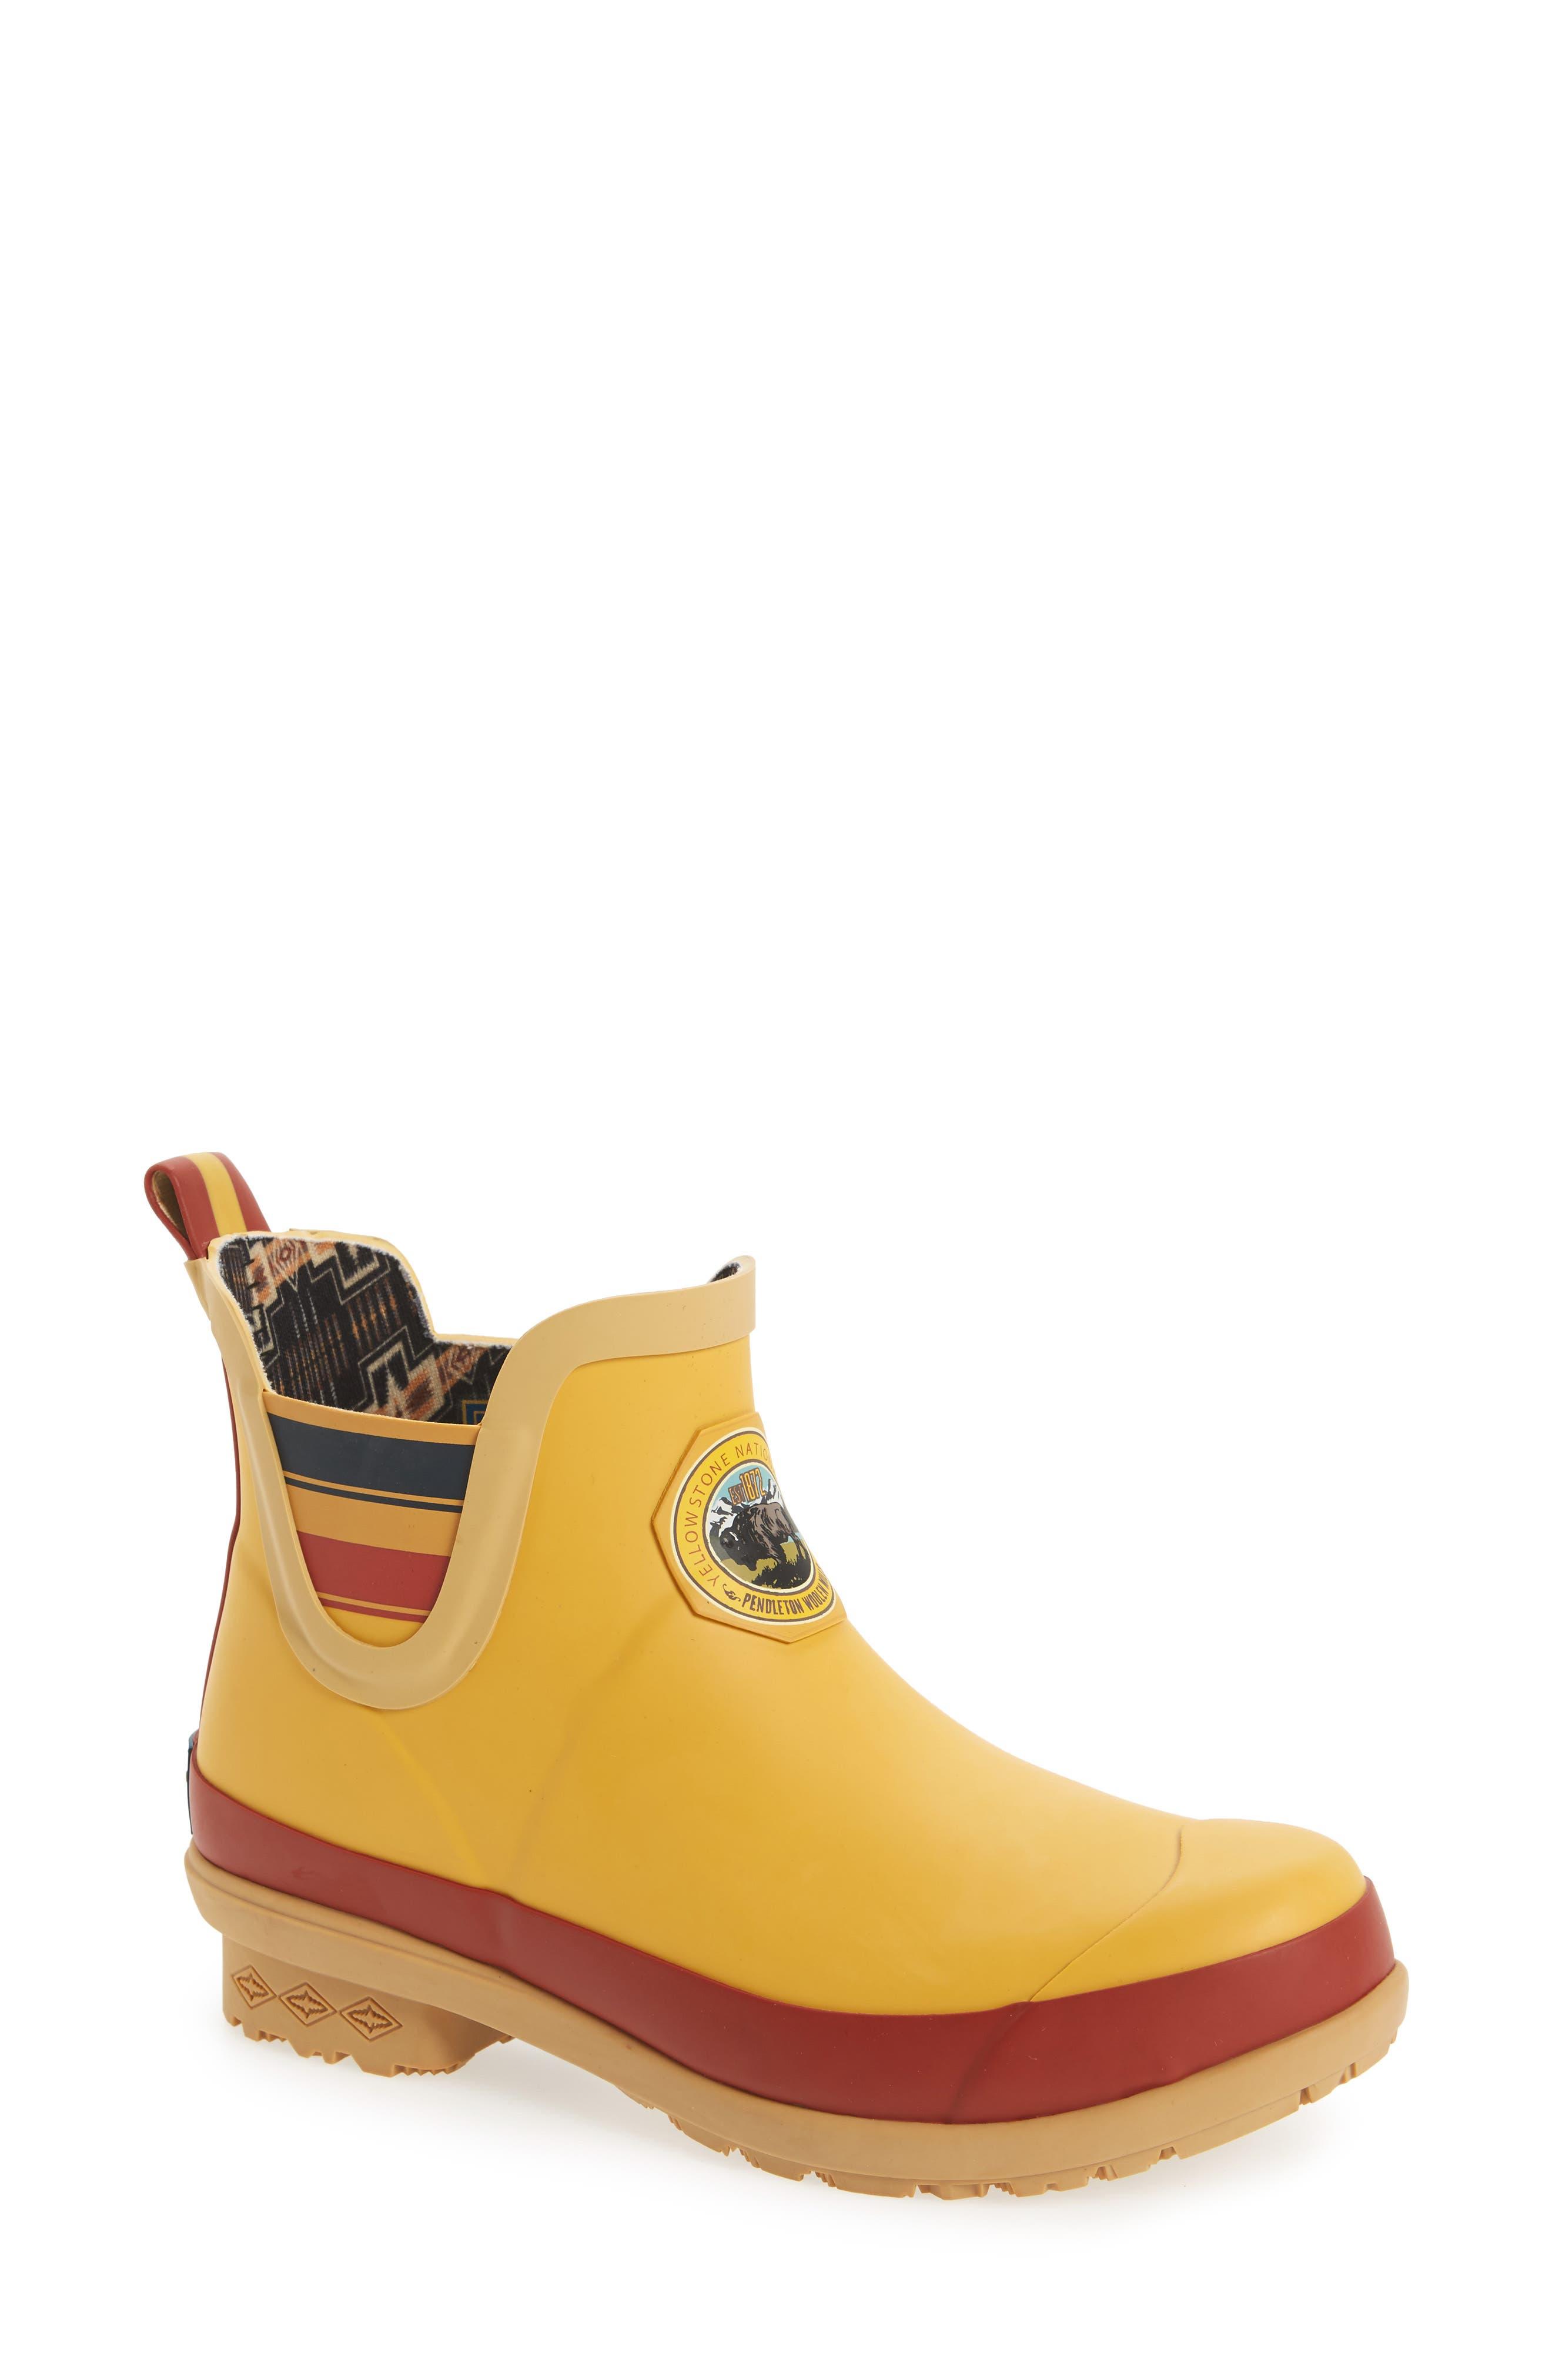 Yellowstone National Park Chelsea Waterproof Rain Boot, Main, color, YELLOW